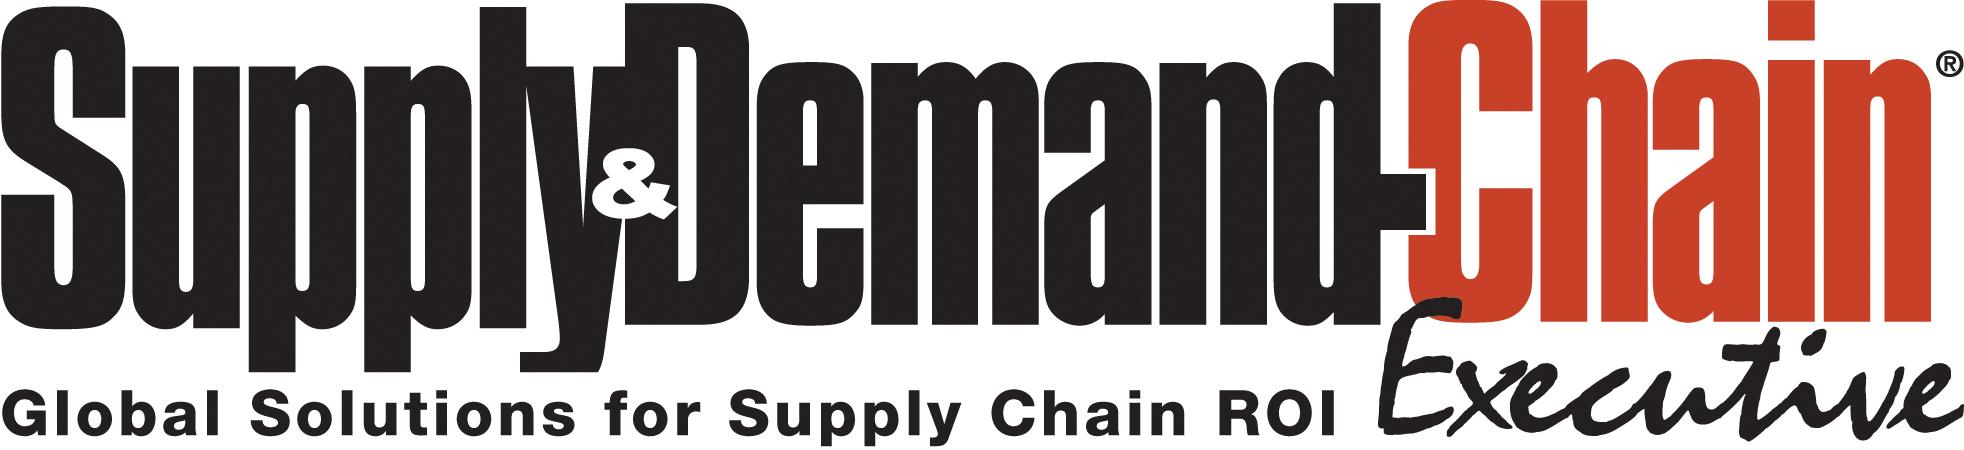 Supply and Demand Chain